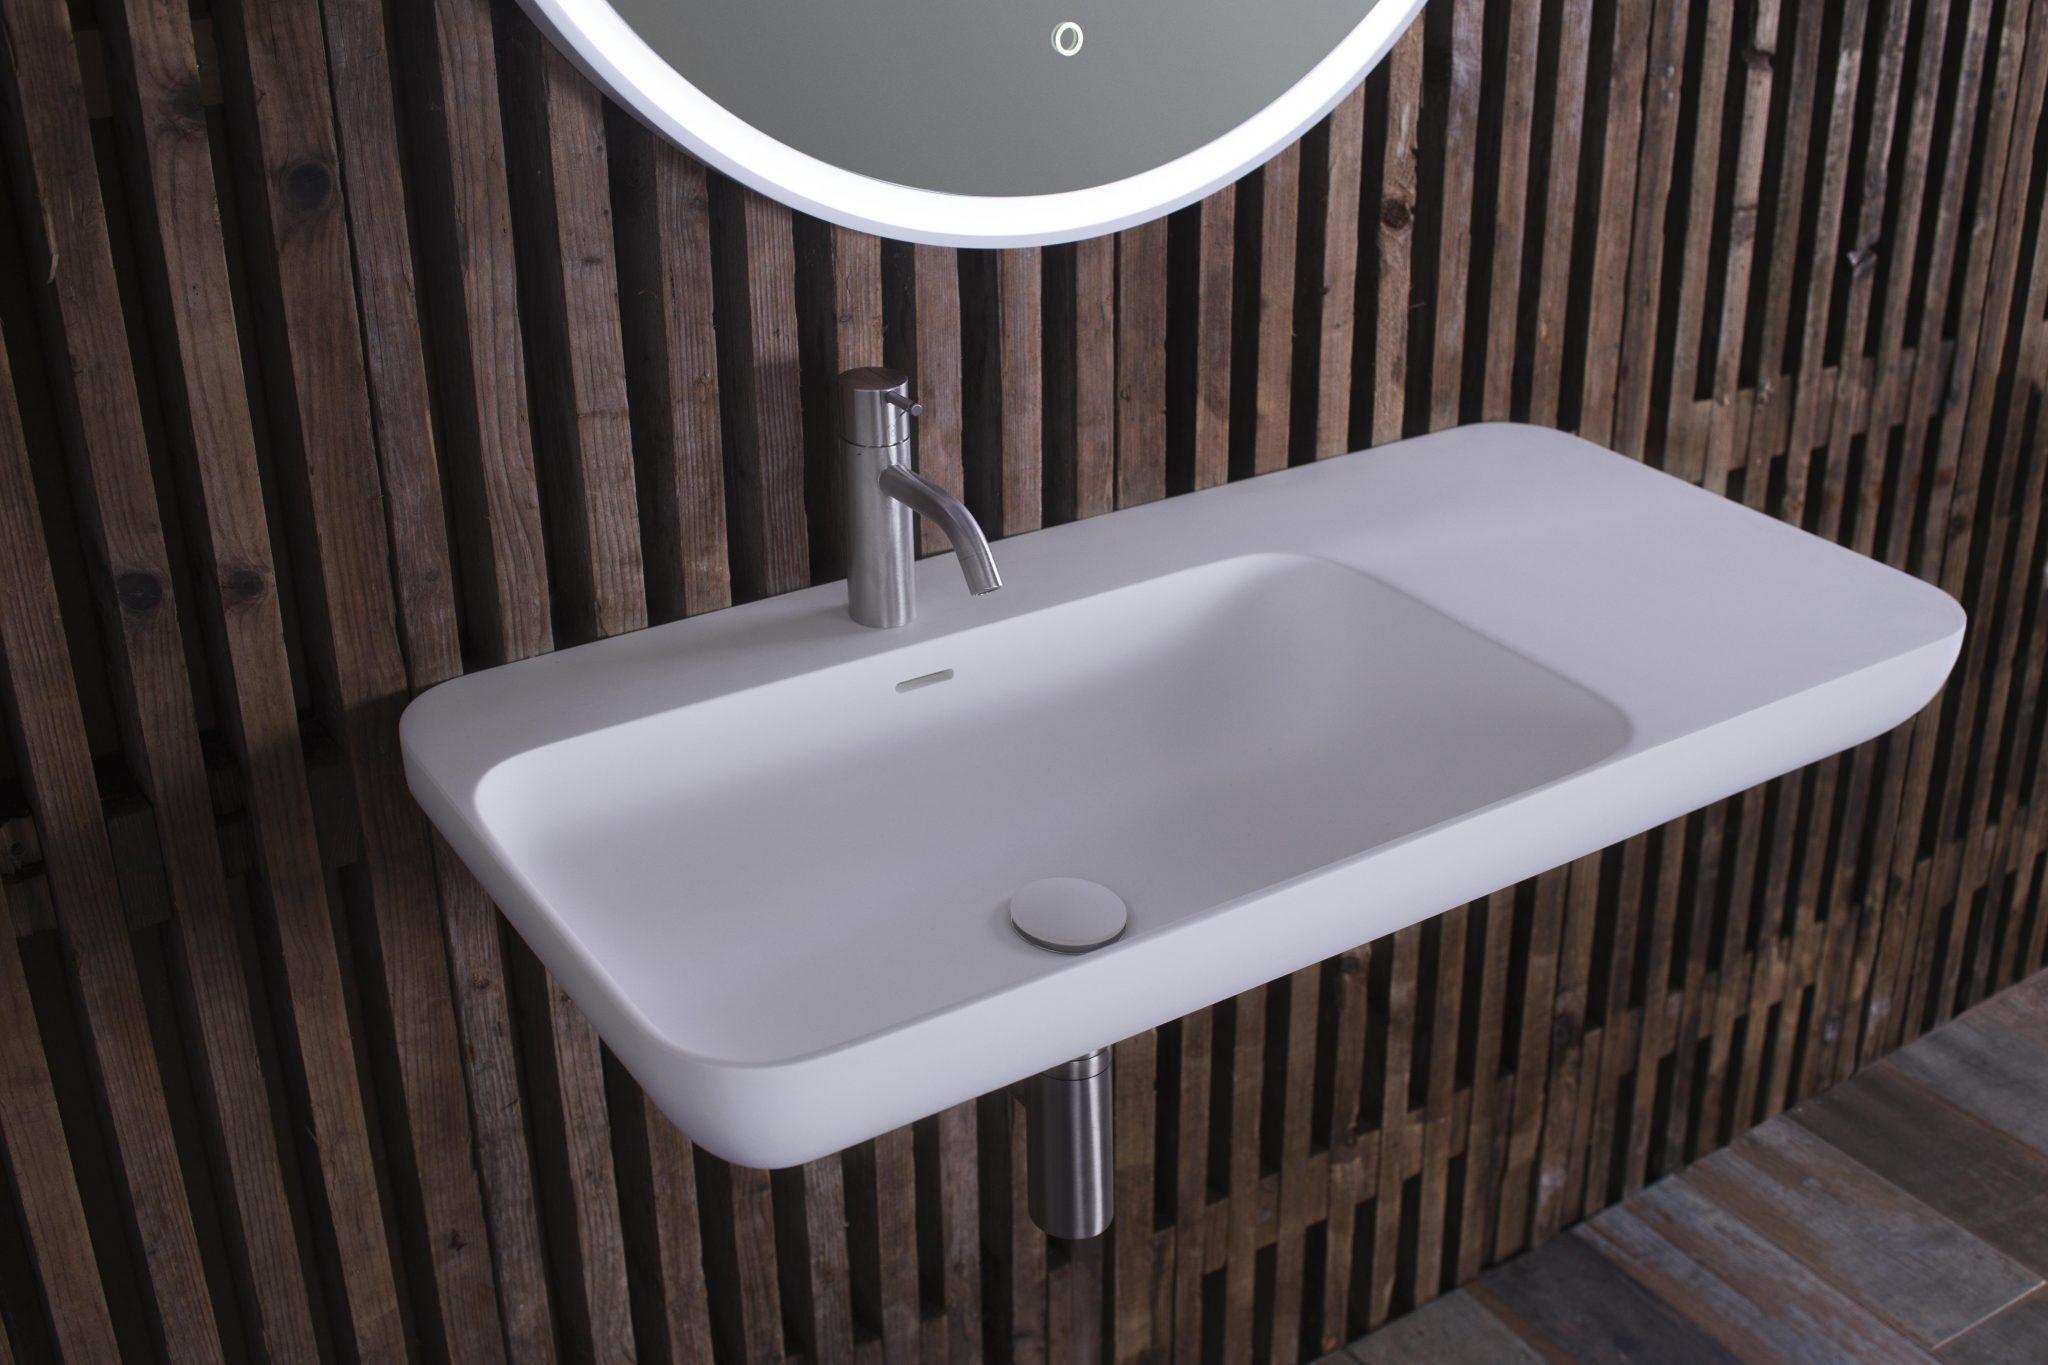 en-90-wash-basin-from-copenhagen-bath_27072624060_o